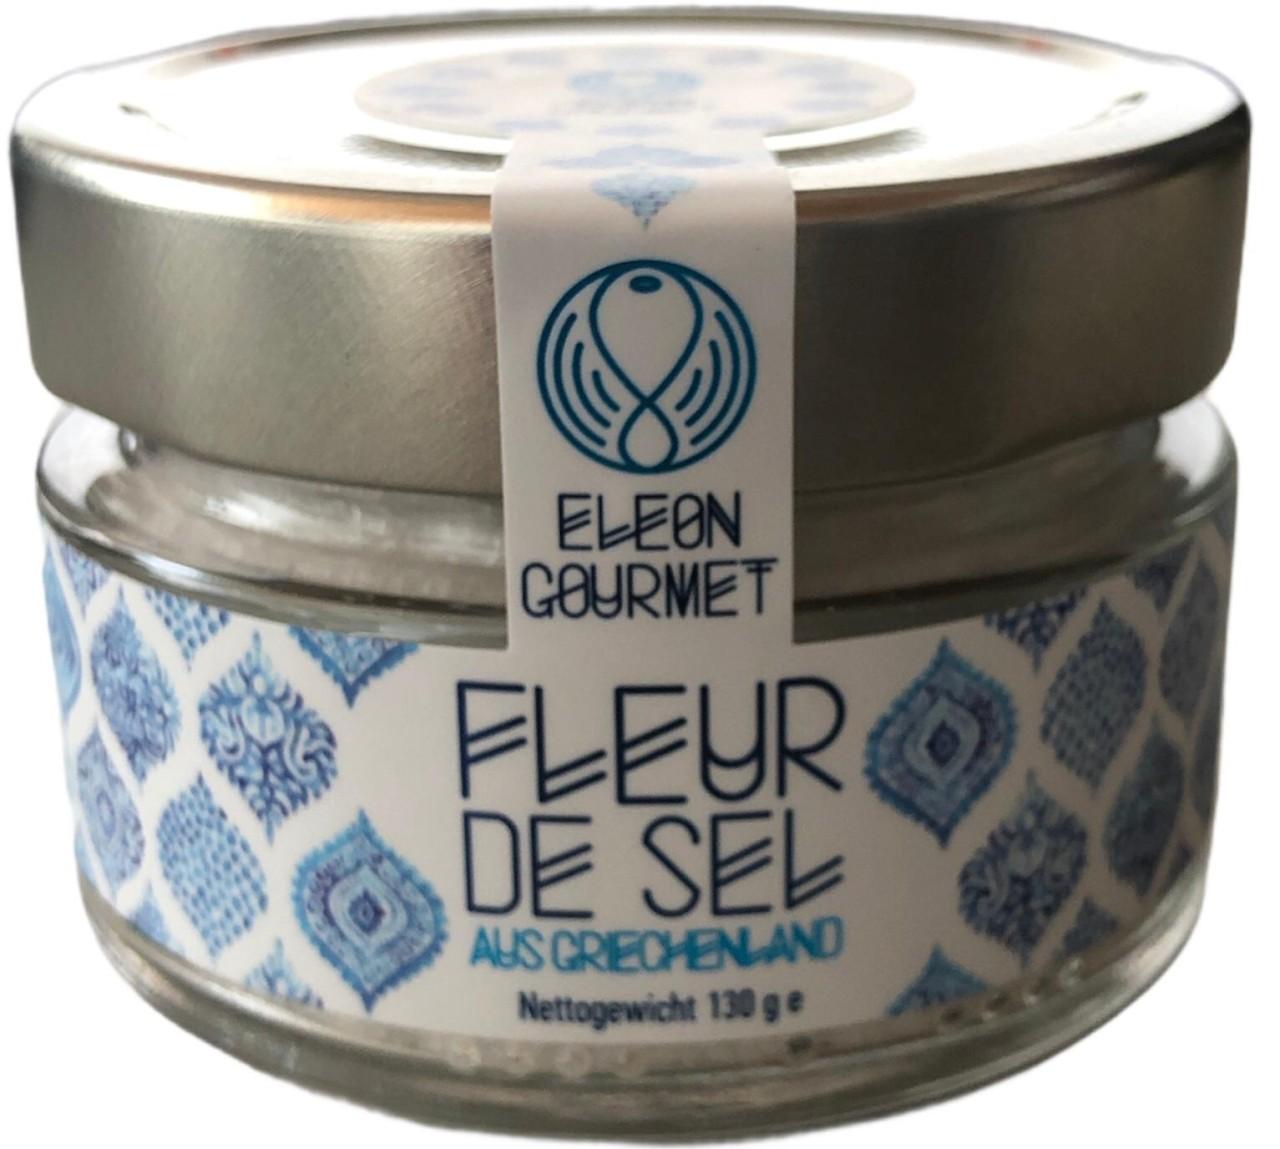 Eleon Gourmet Fleur de Sel aus Griechenland 130g